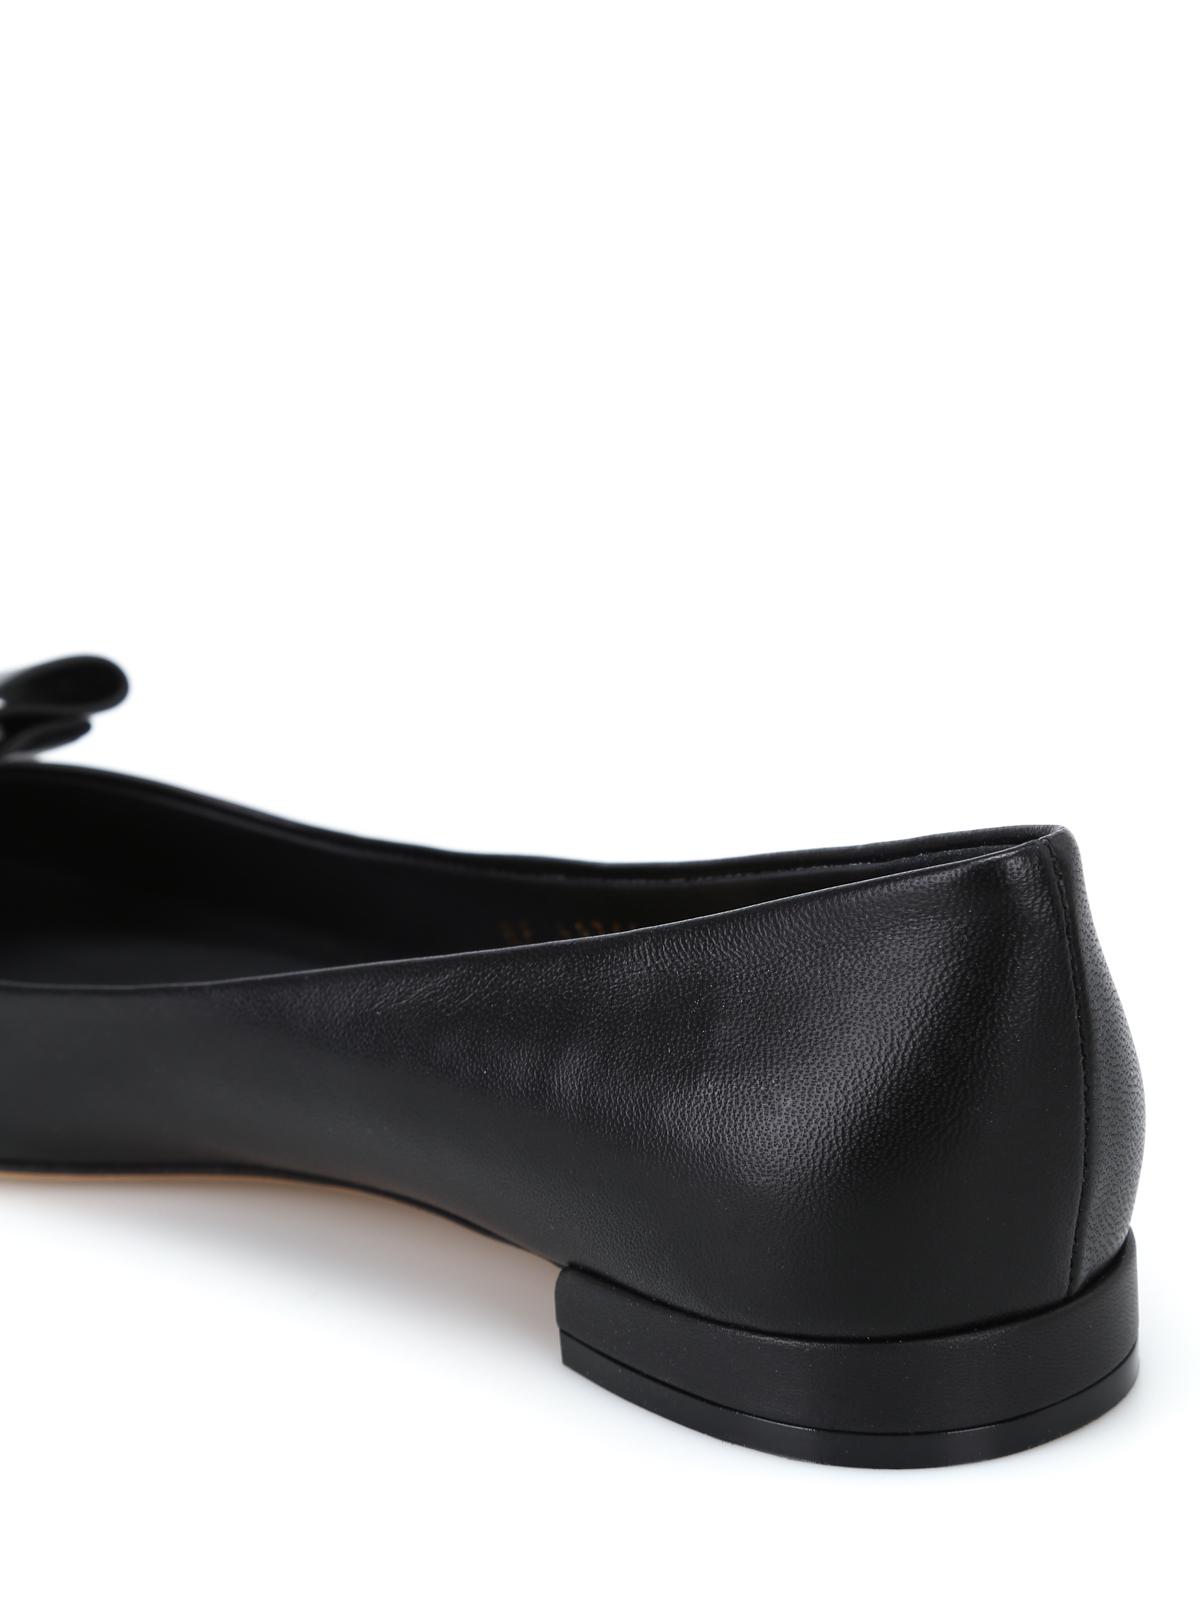 d84b88faa72 Salvatore Ferragamo - Varina black leather flats - flat shoes ...